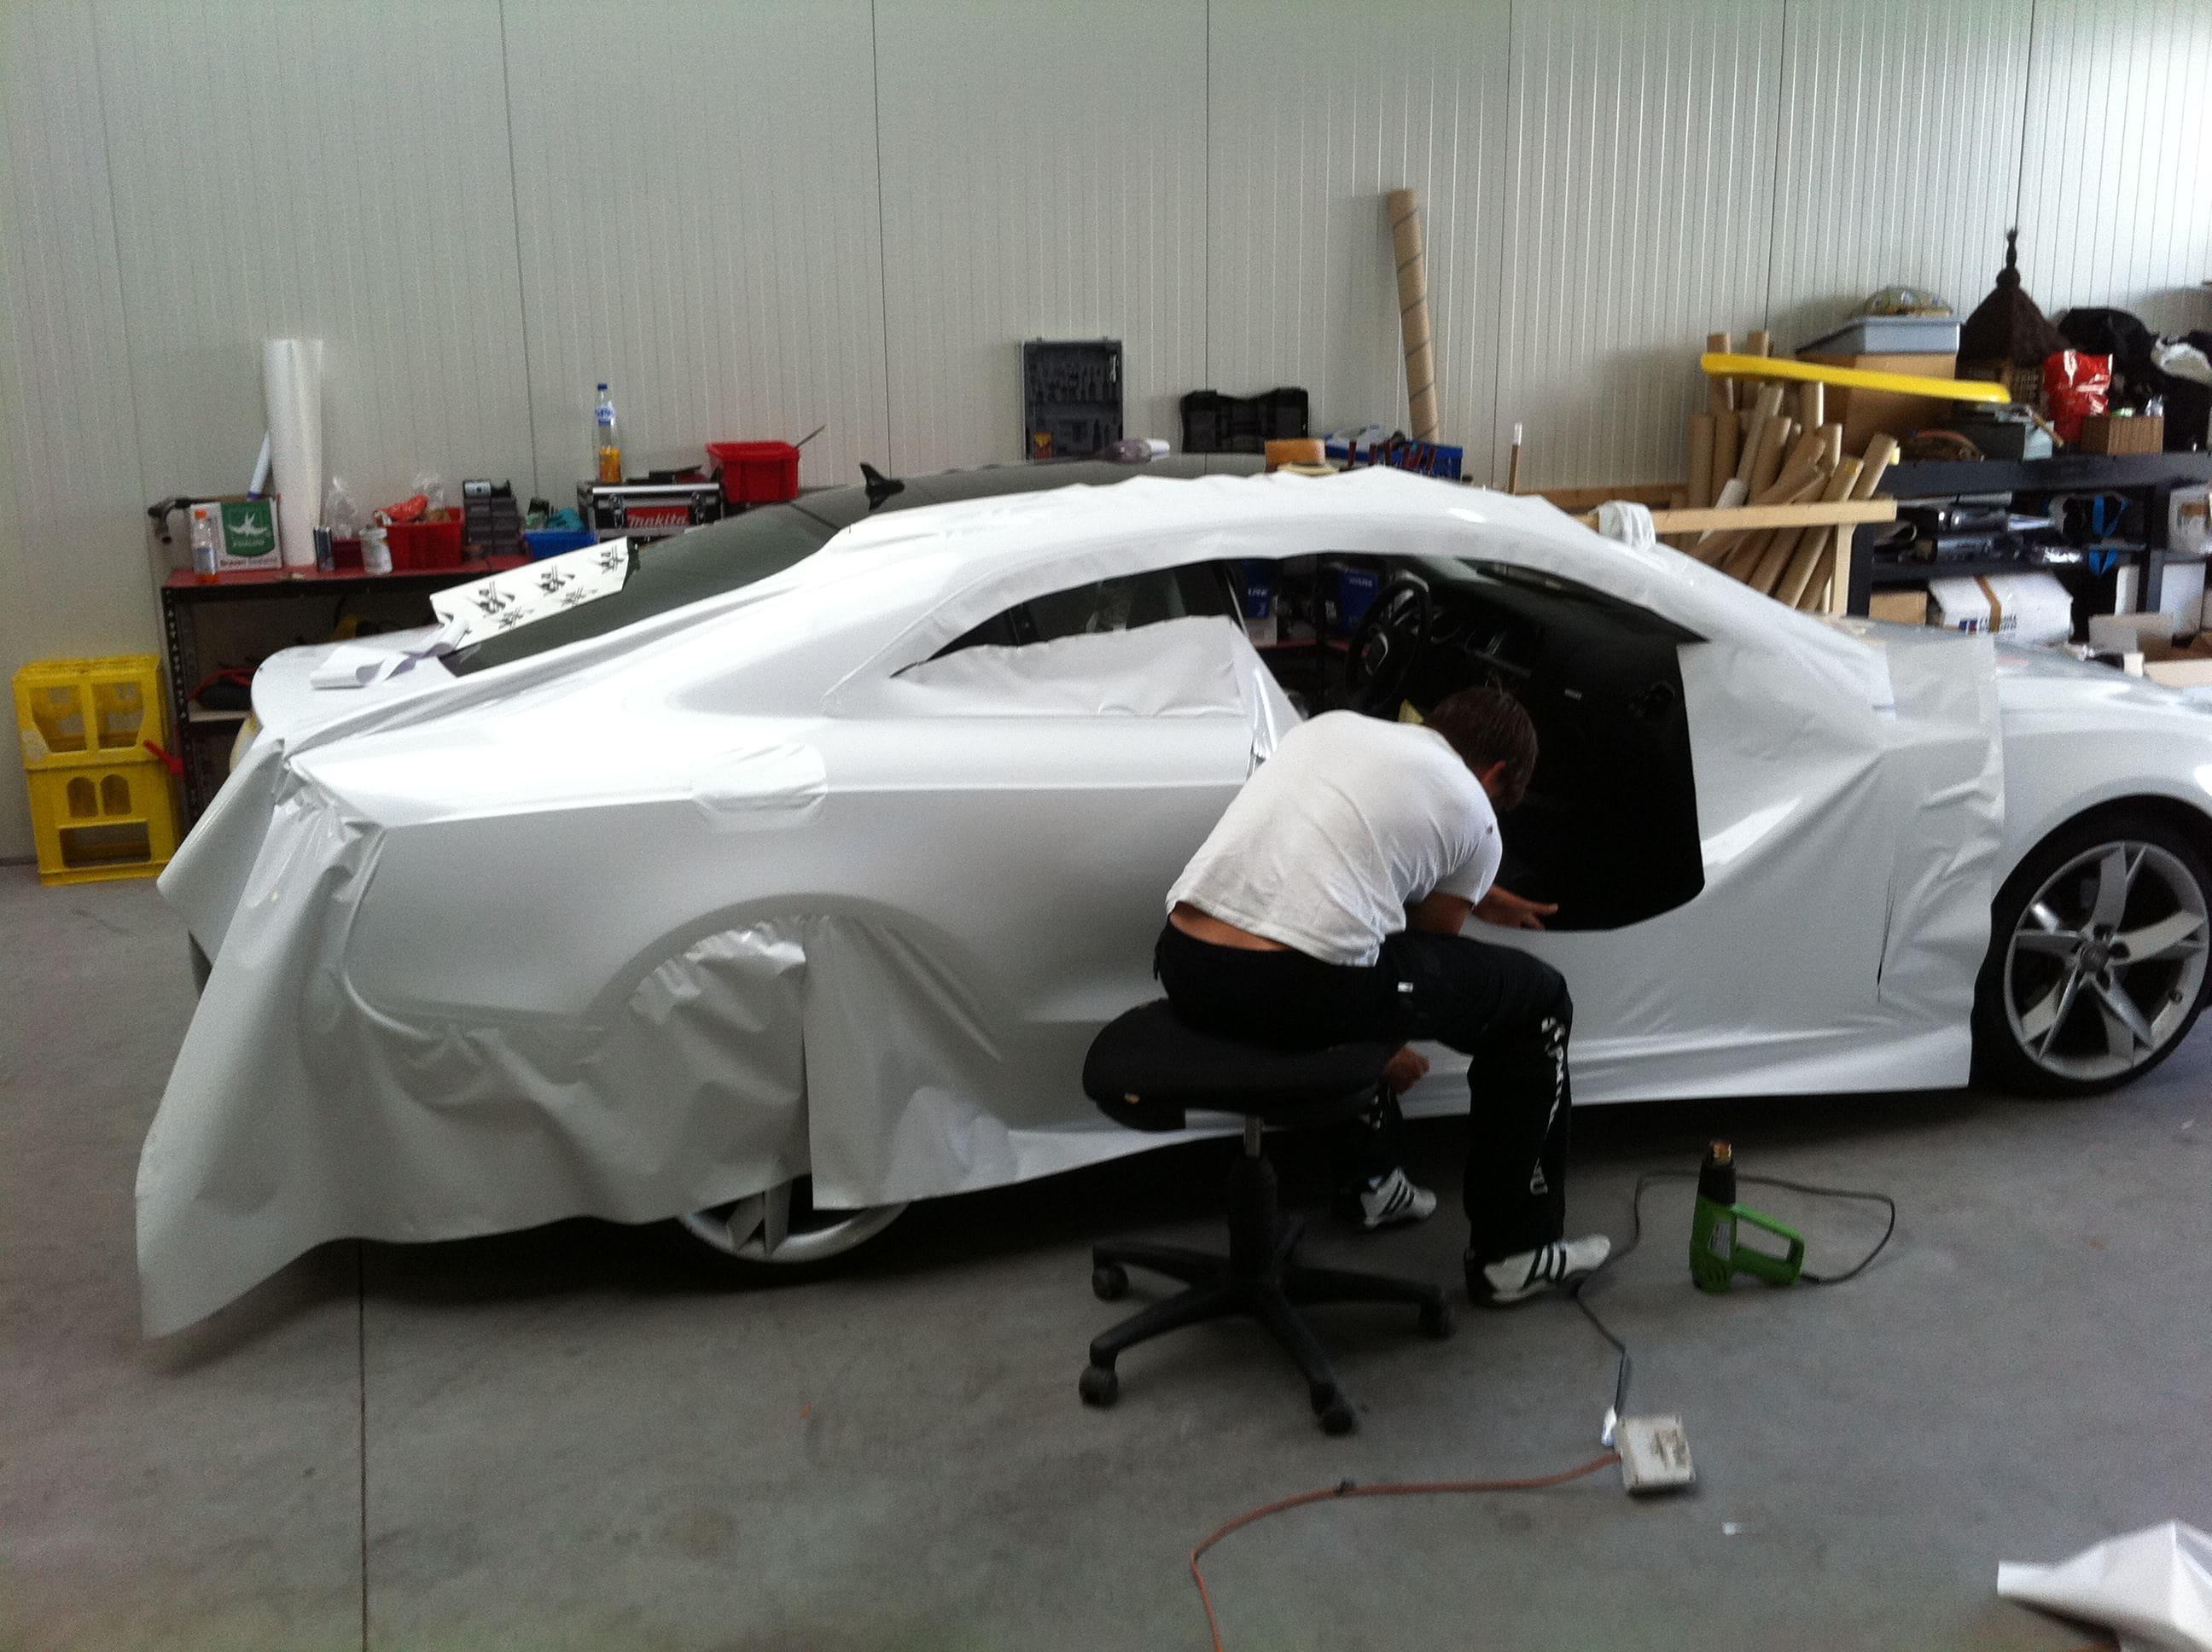 Audi A5 coupe met Metallic Witte Wrap, Carwrapping door Wrapmyride.nu Foto-nr:4662, ©2021